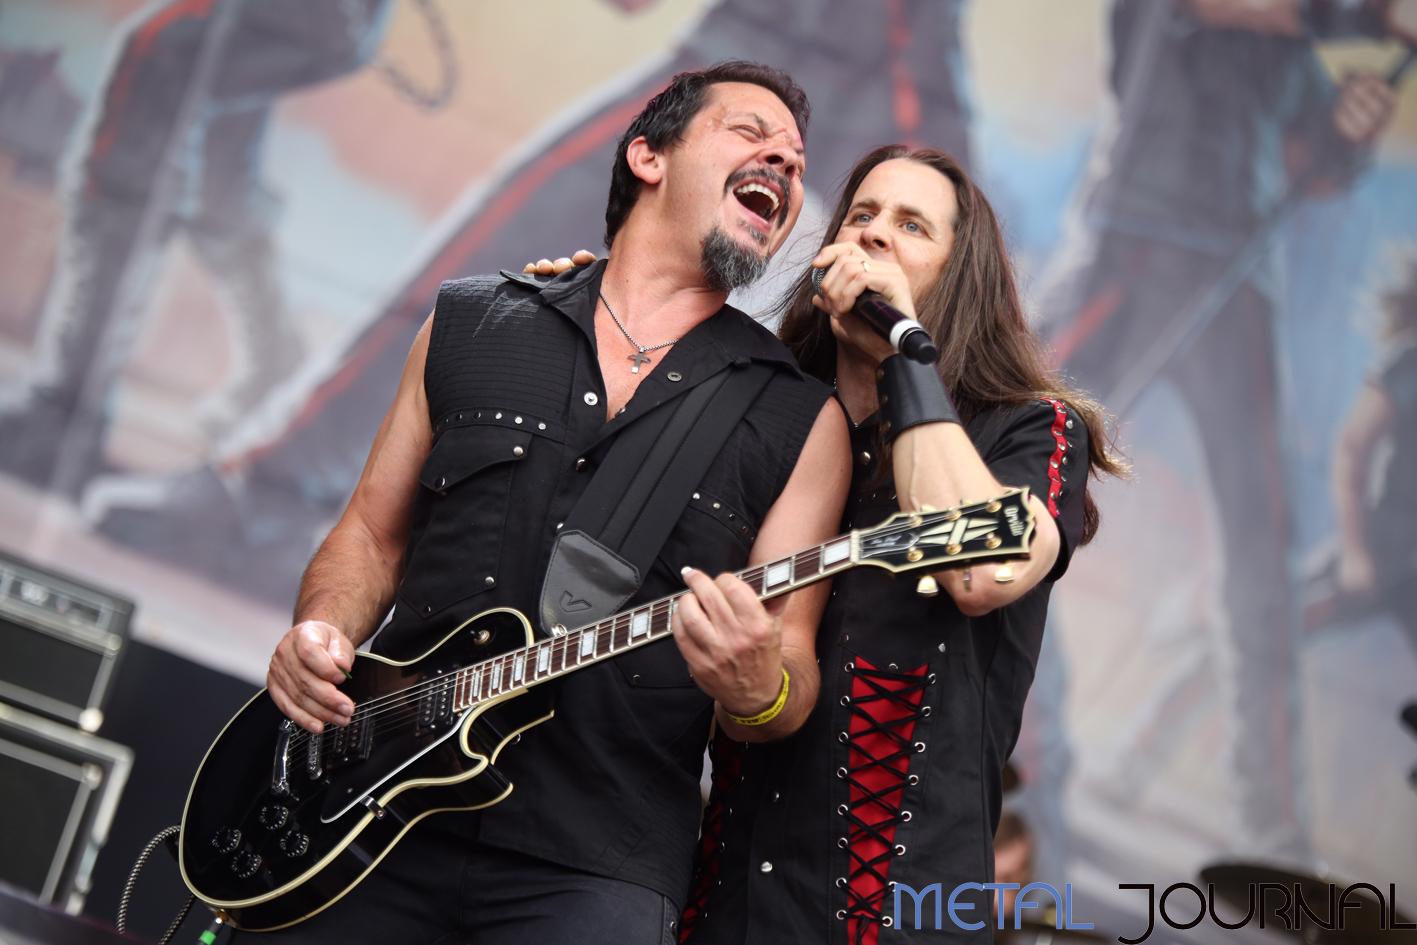 riot v - leyendas del rock 2018 pic 4